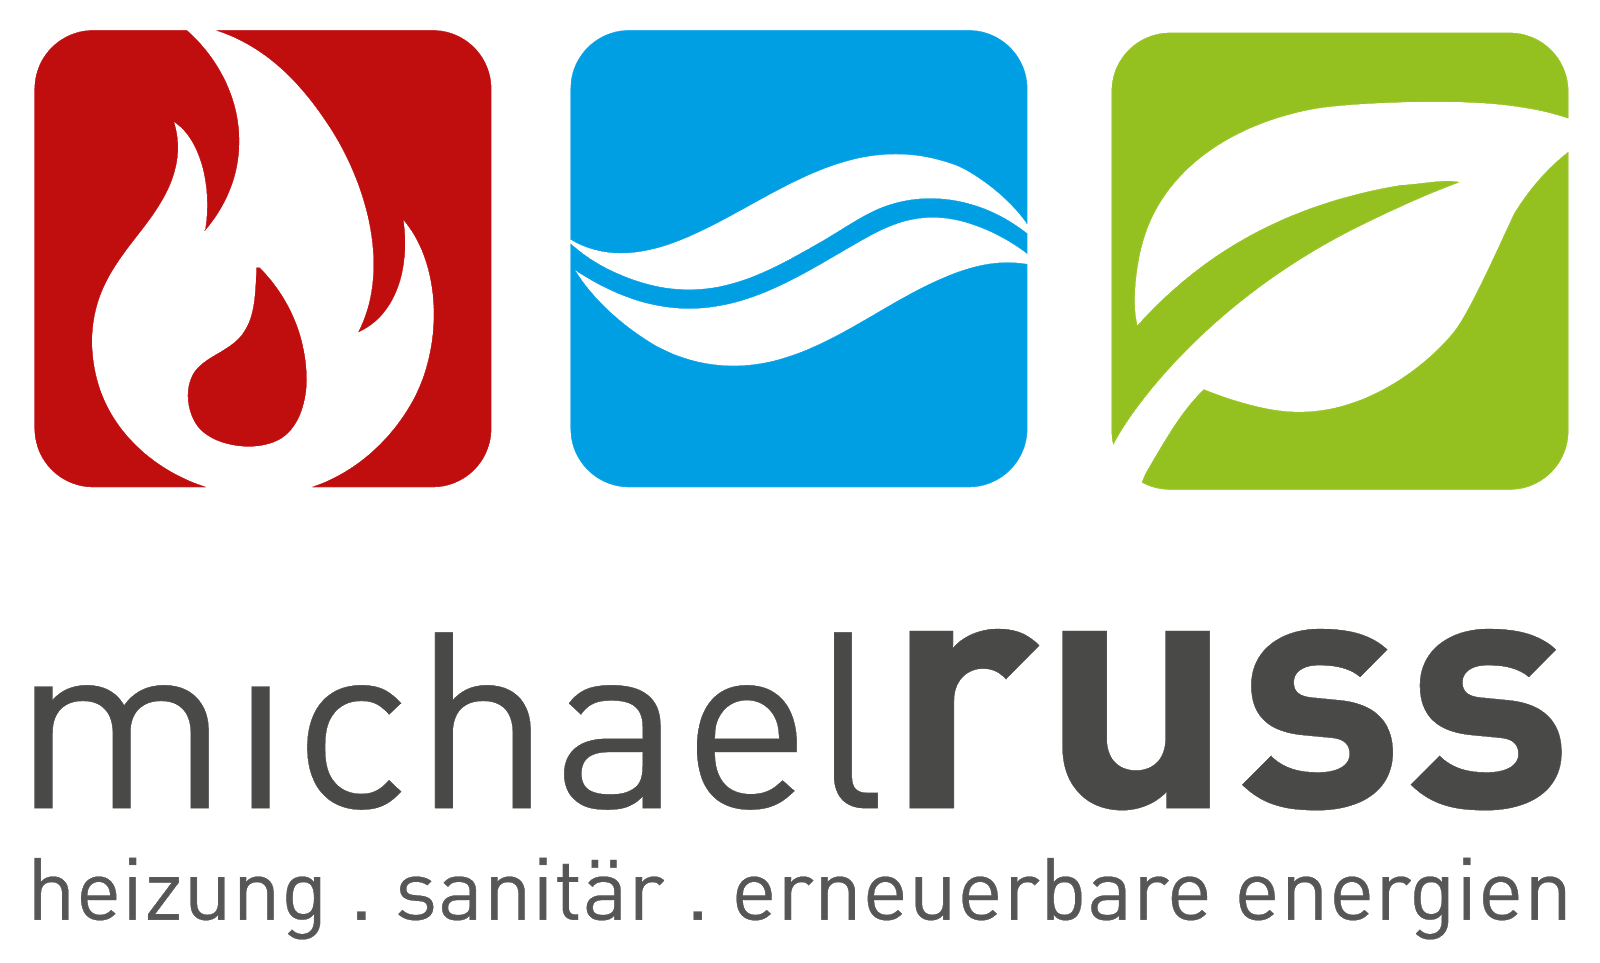 Michael Russ